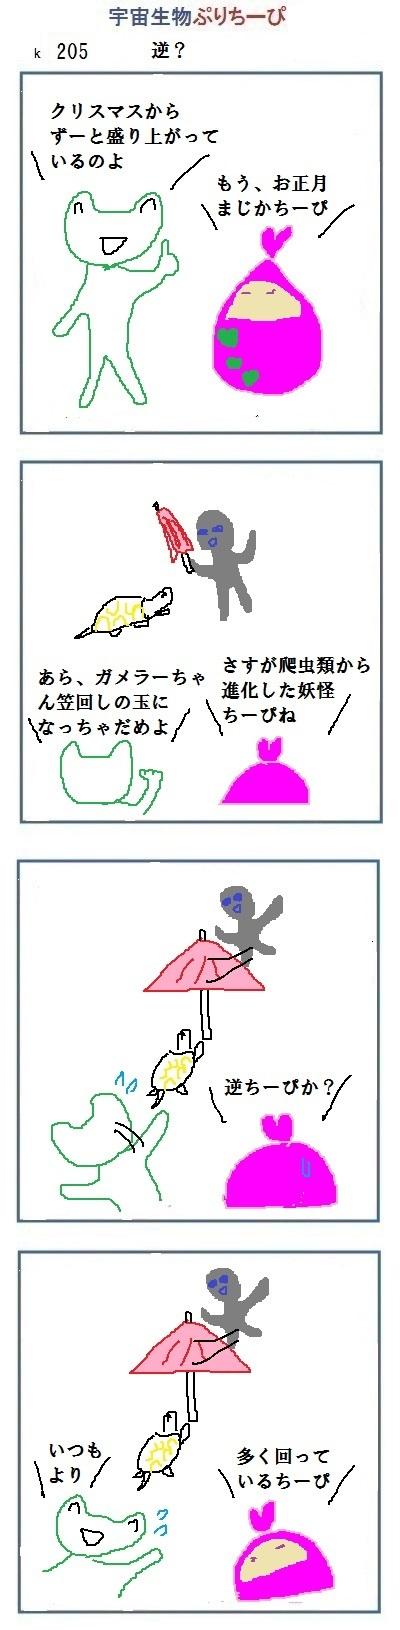 2016120721101505e.jpg